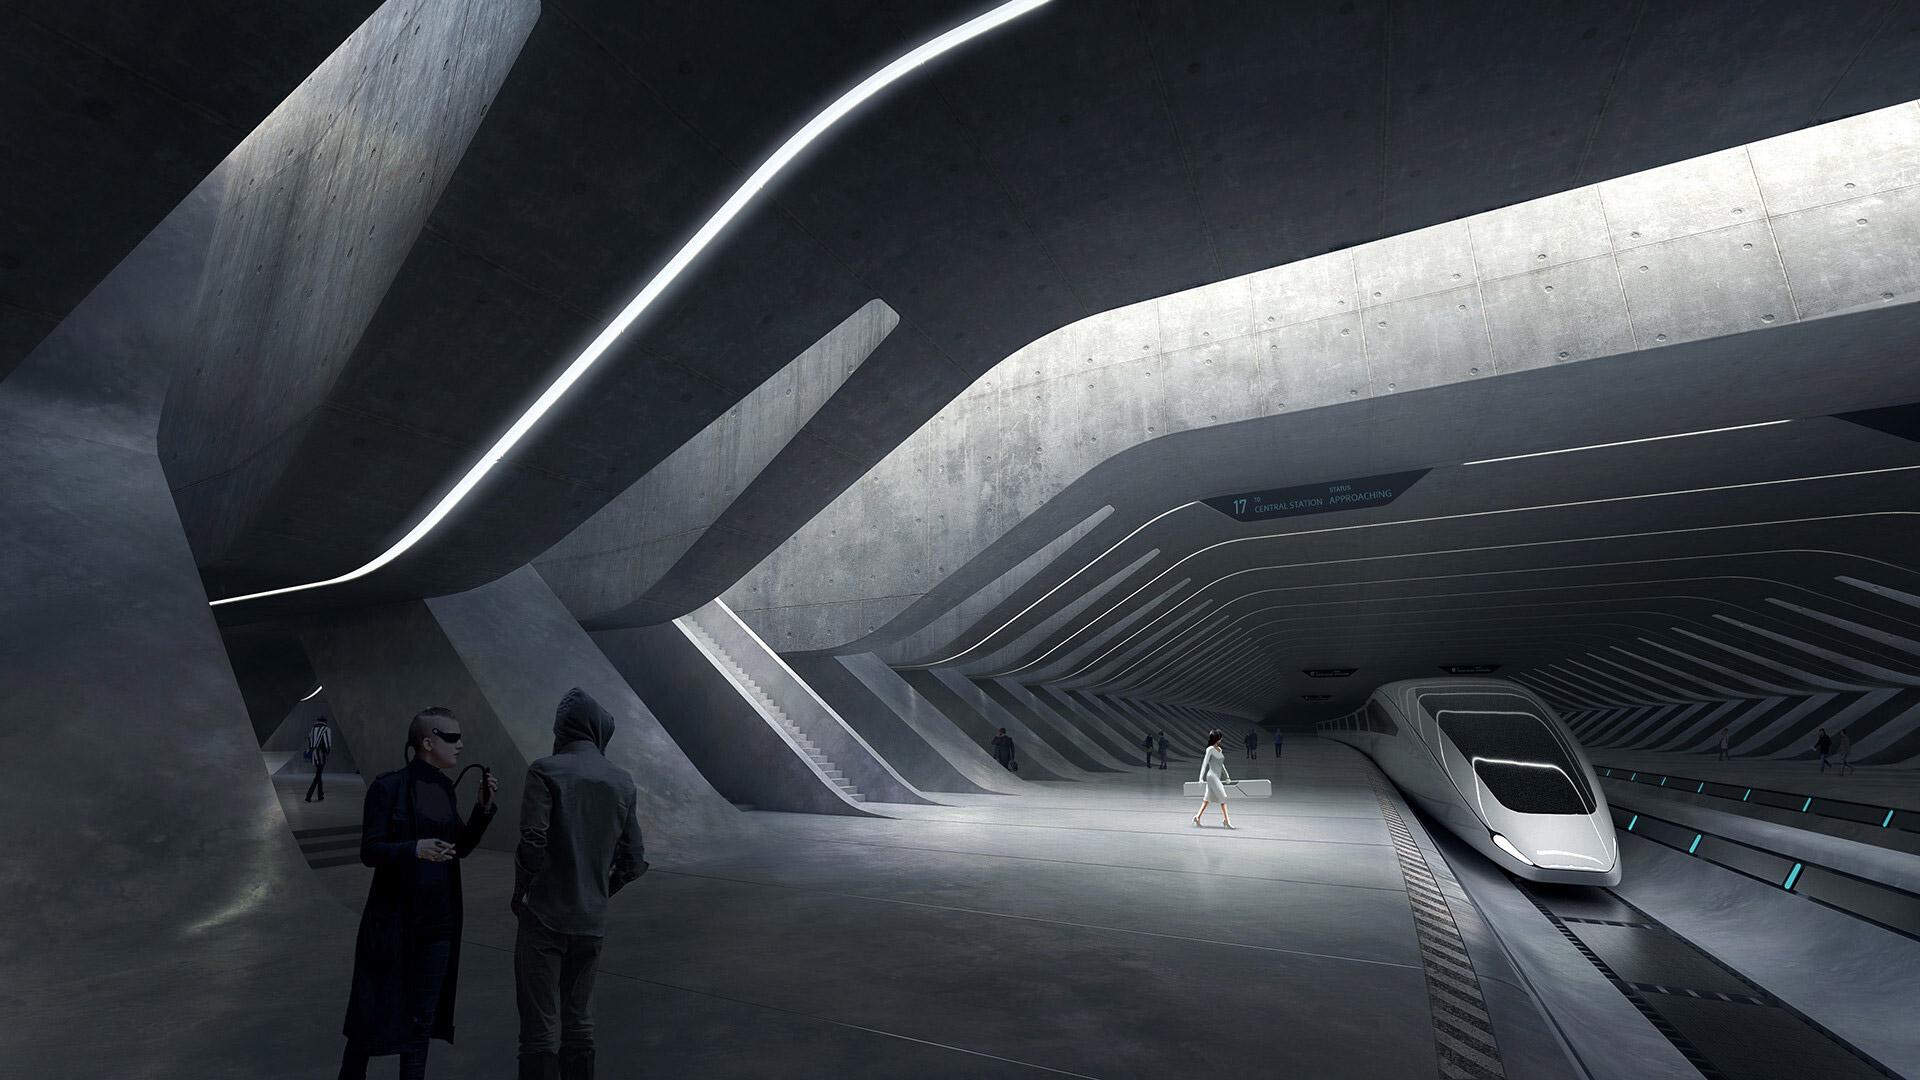 Impressive Sci-Fi Artworks by Tarmo Juhola